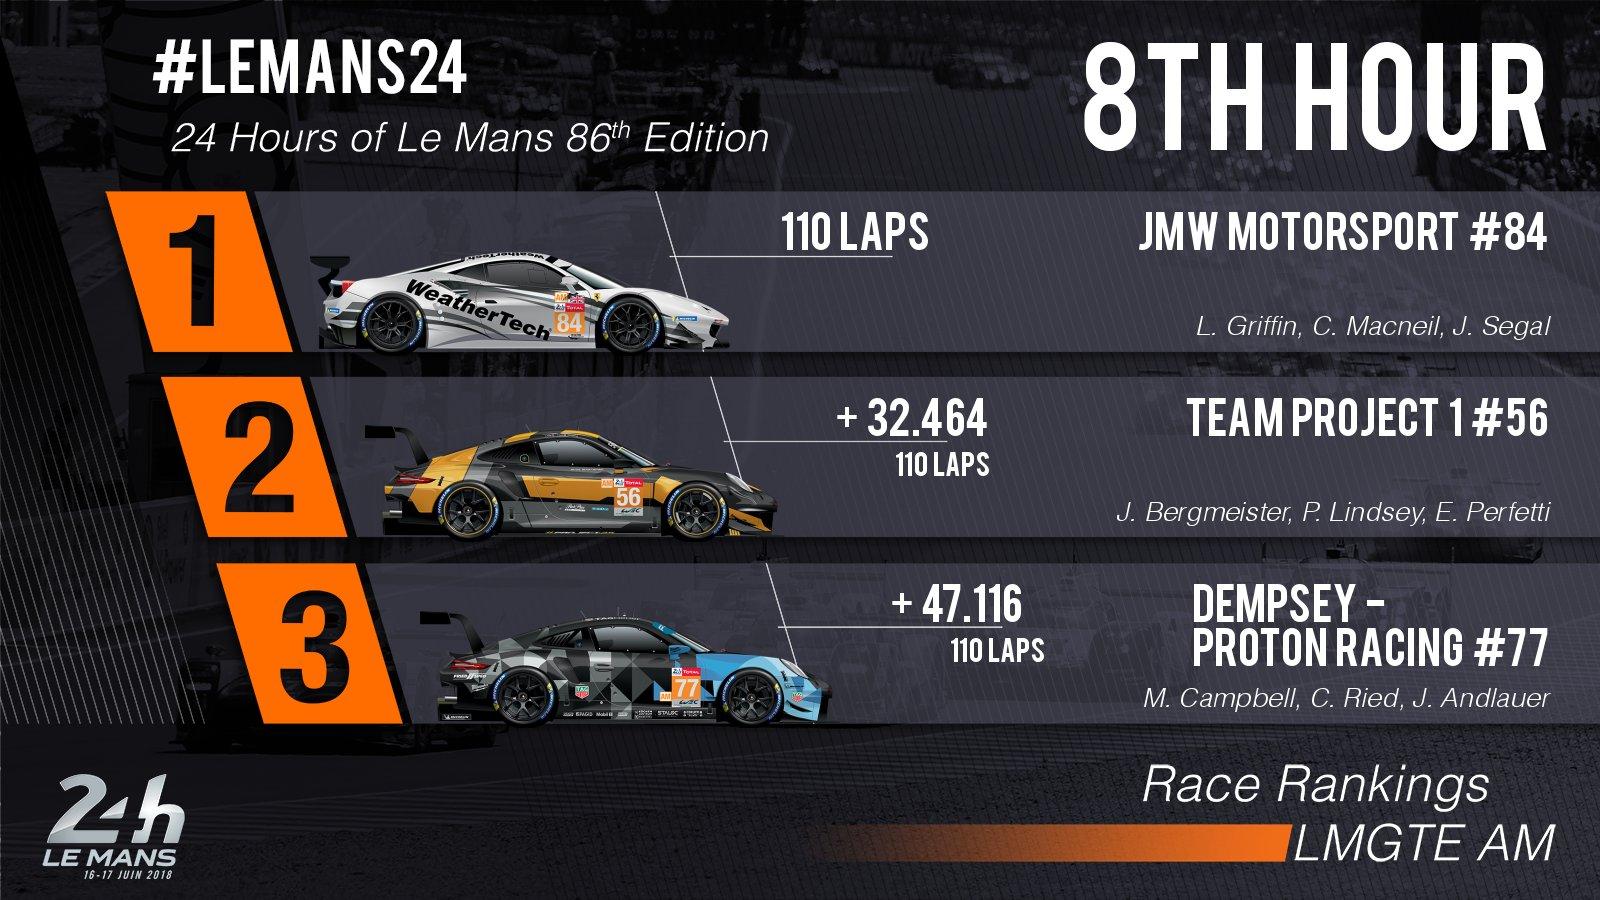 24 Horas de Le Mans 2018 - Página 3 Df12xOgW4AA3lGZ